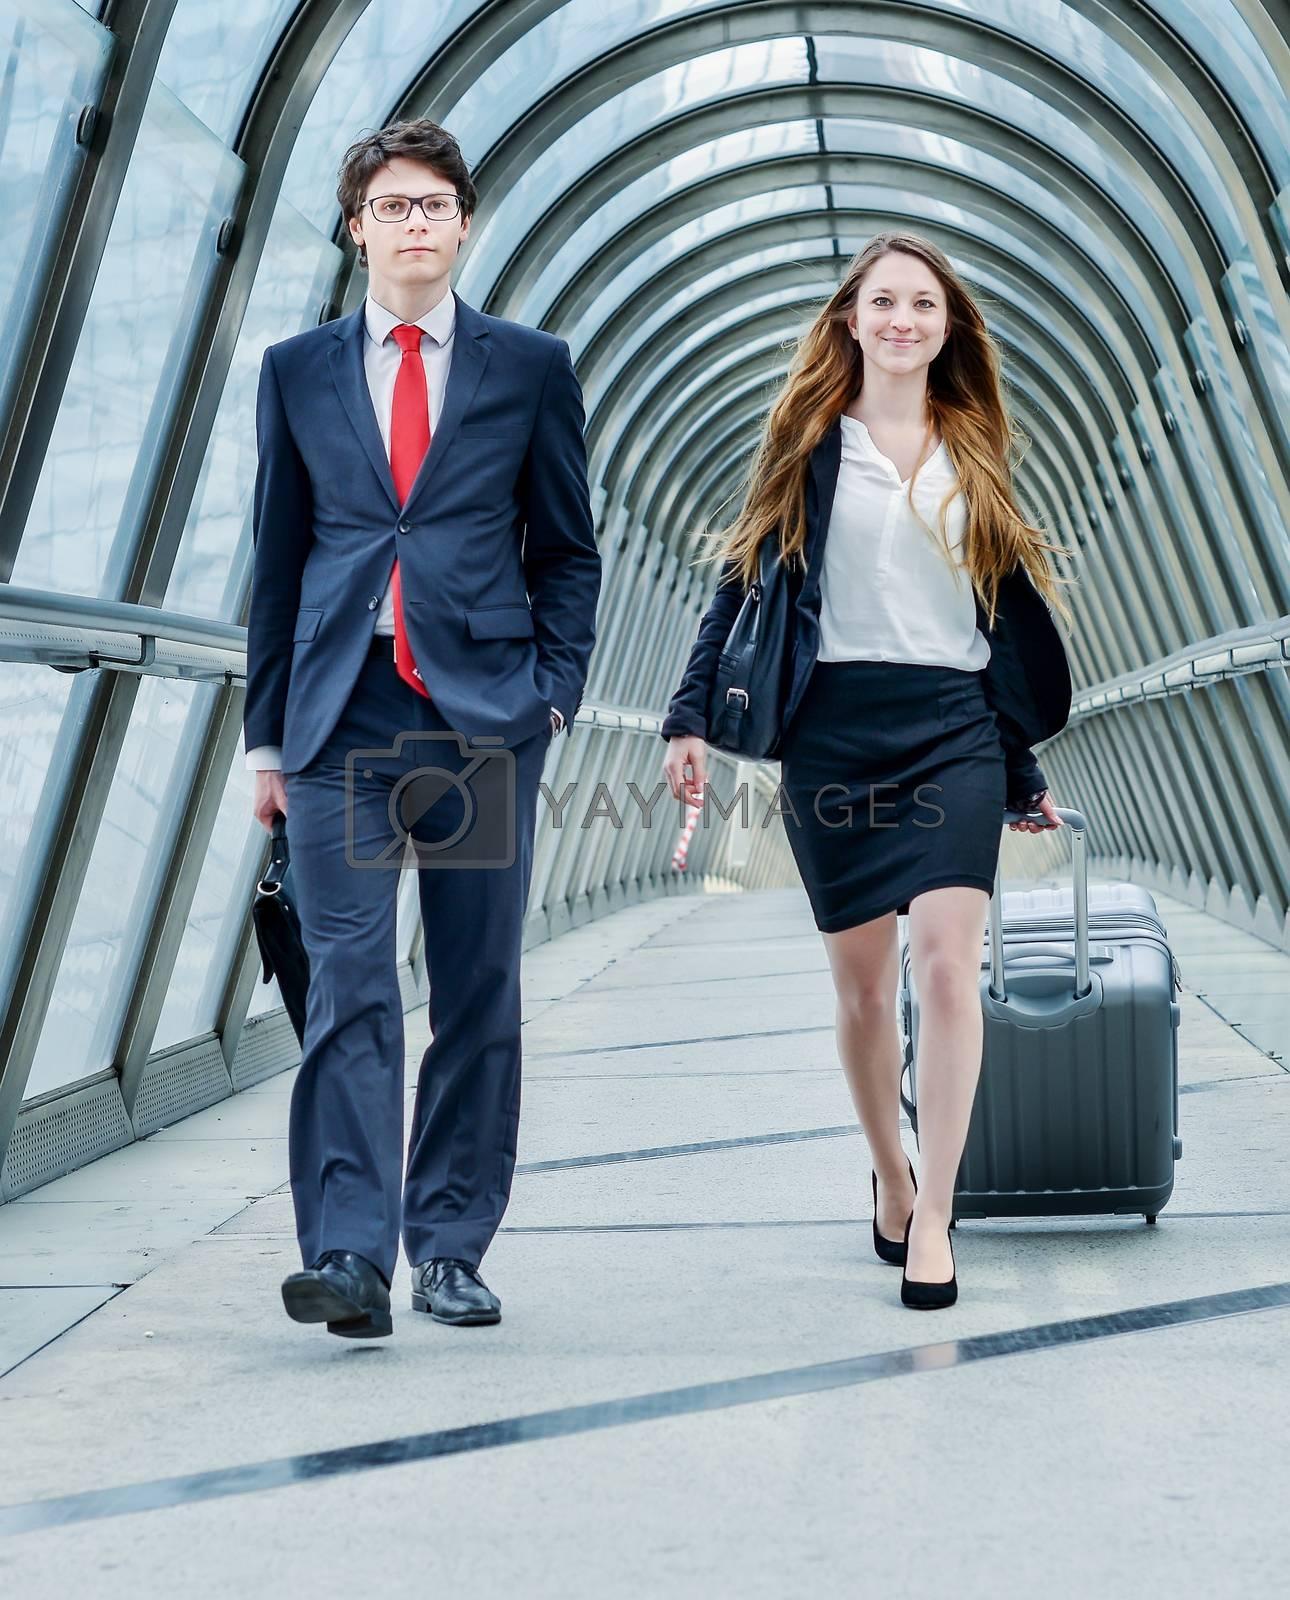 Junior executives dynamics in business trip or corporate seminar